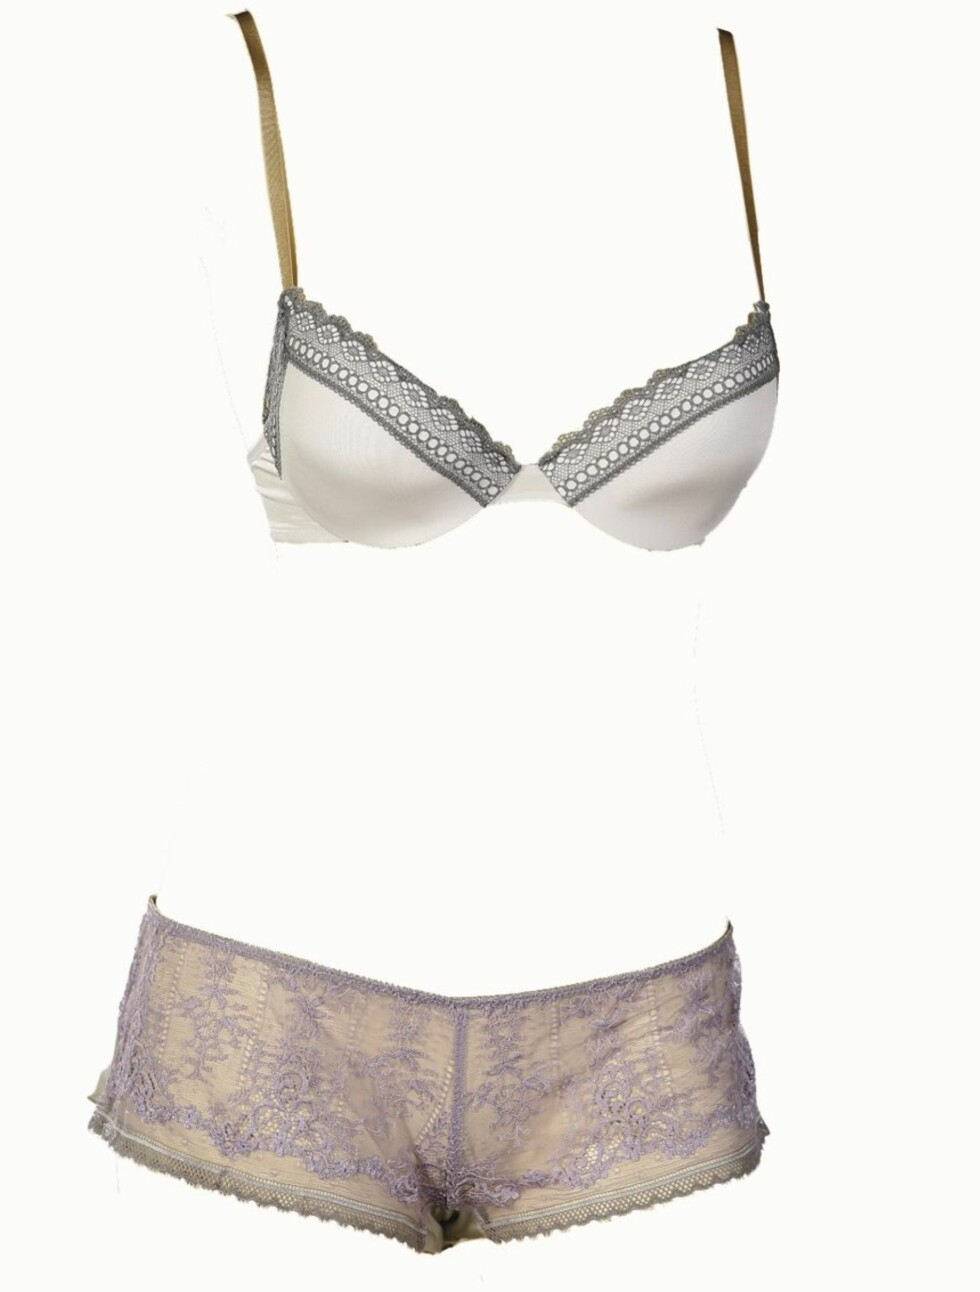 SEXY MIKS: Hvit og grå bh (kr 500, Calvin Klein) og lilla og grå truse (kr 450, Princesse Tam Tam/Lingerie Lounge).